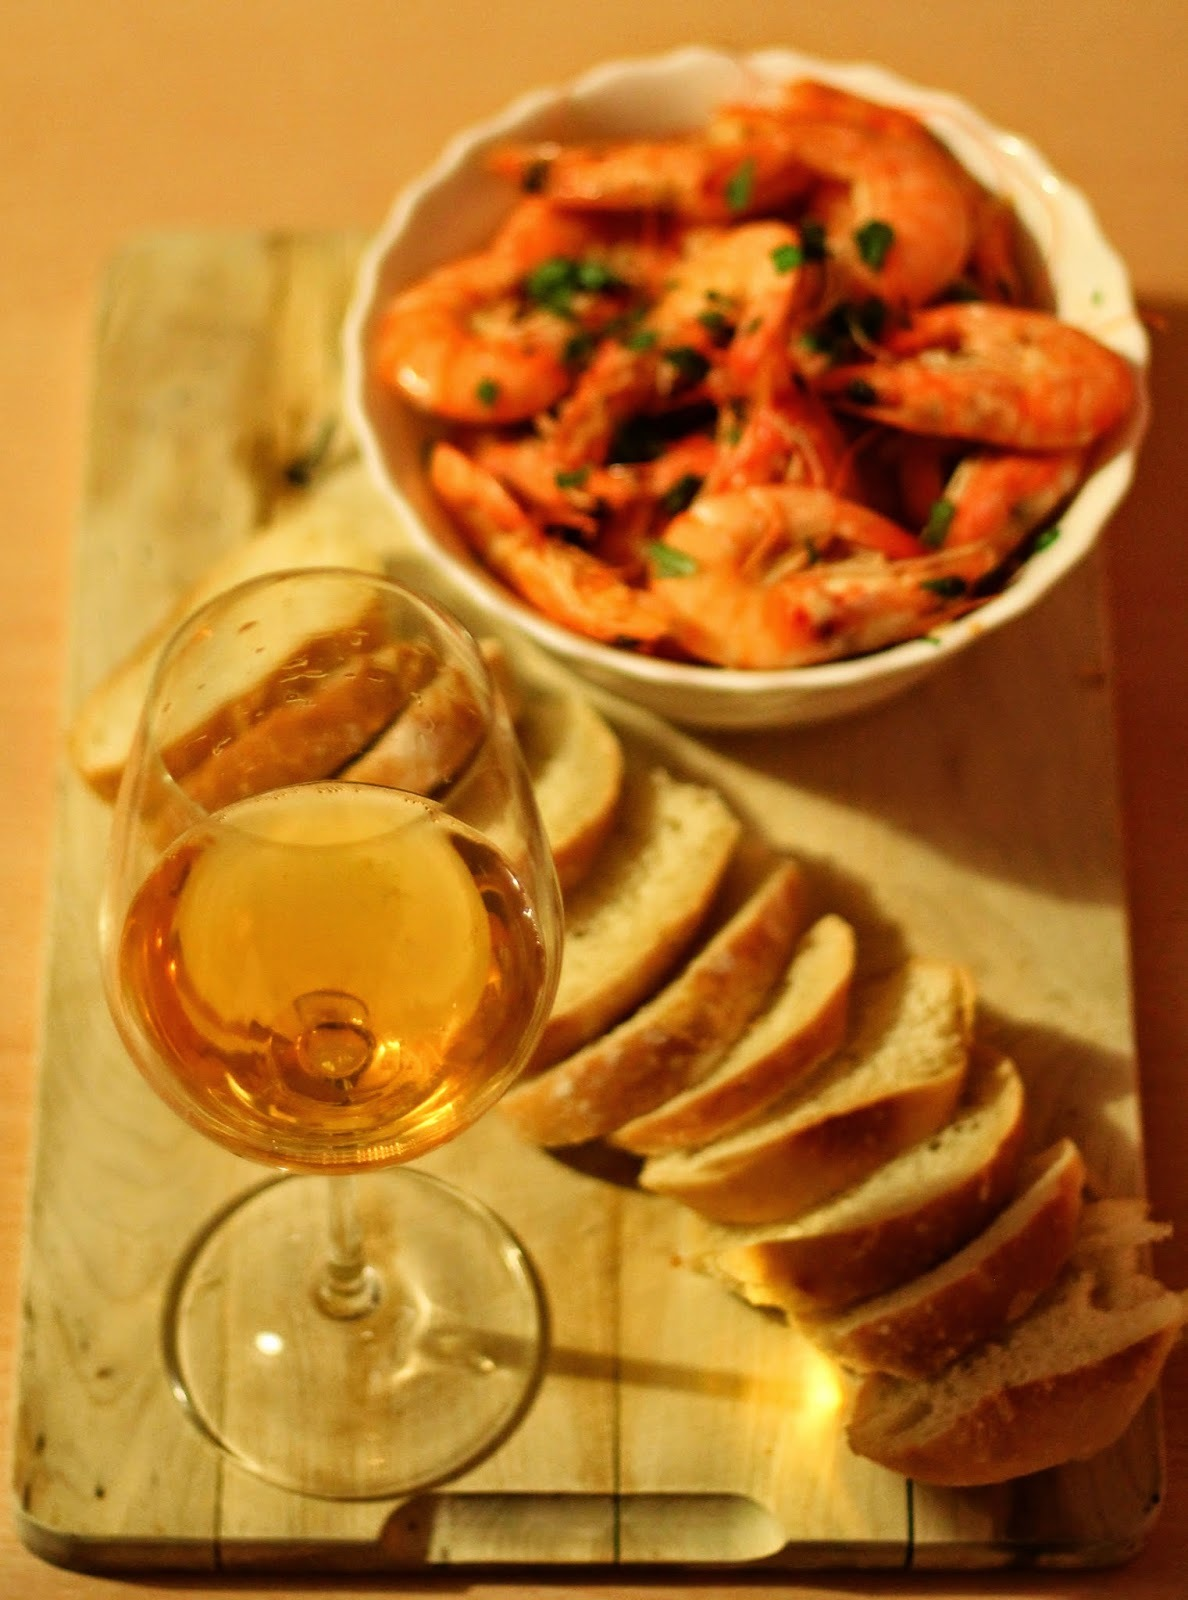 Krevety s česnekem, chilli a ciderem